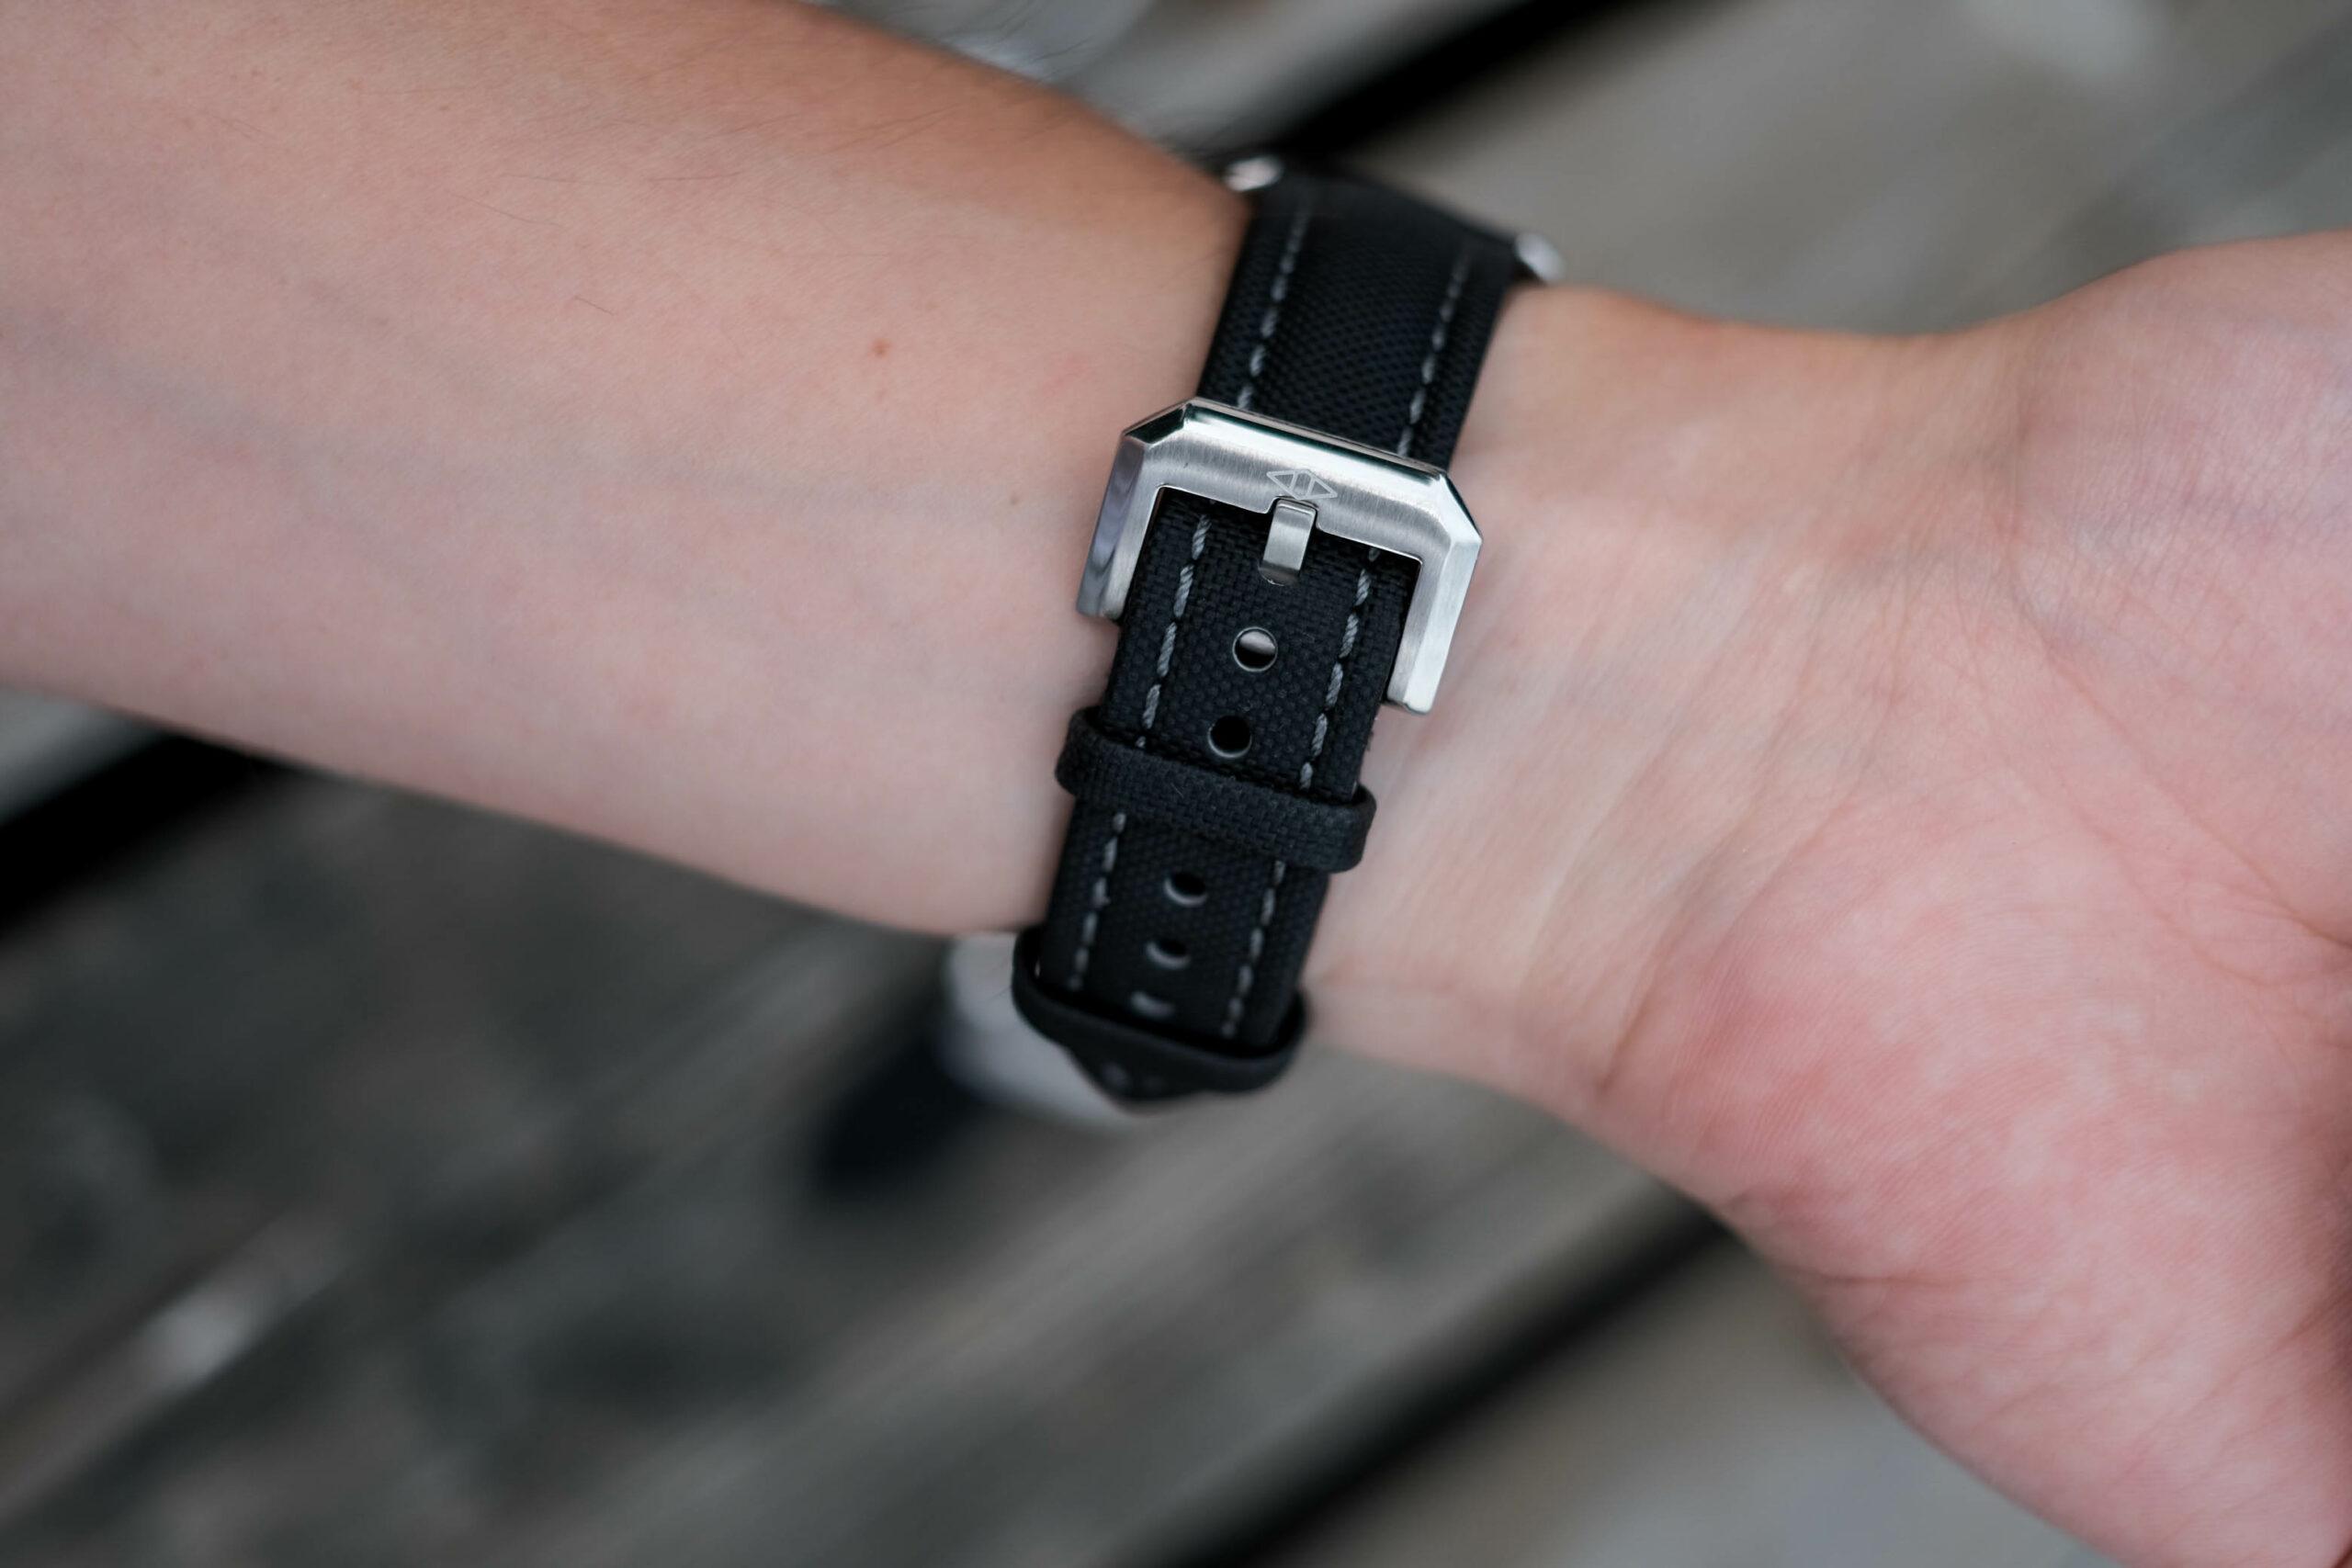 Artem strap on wrist